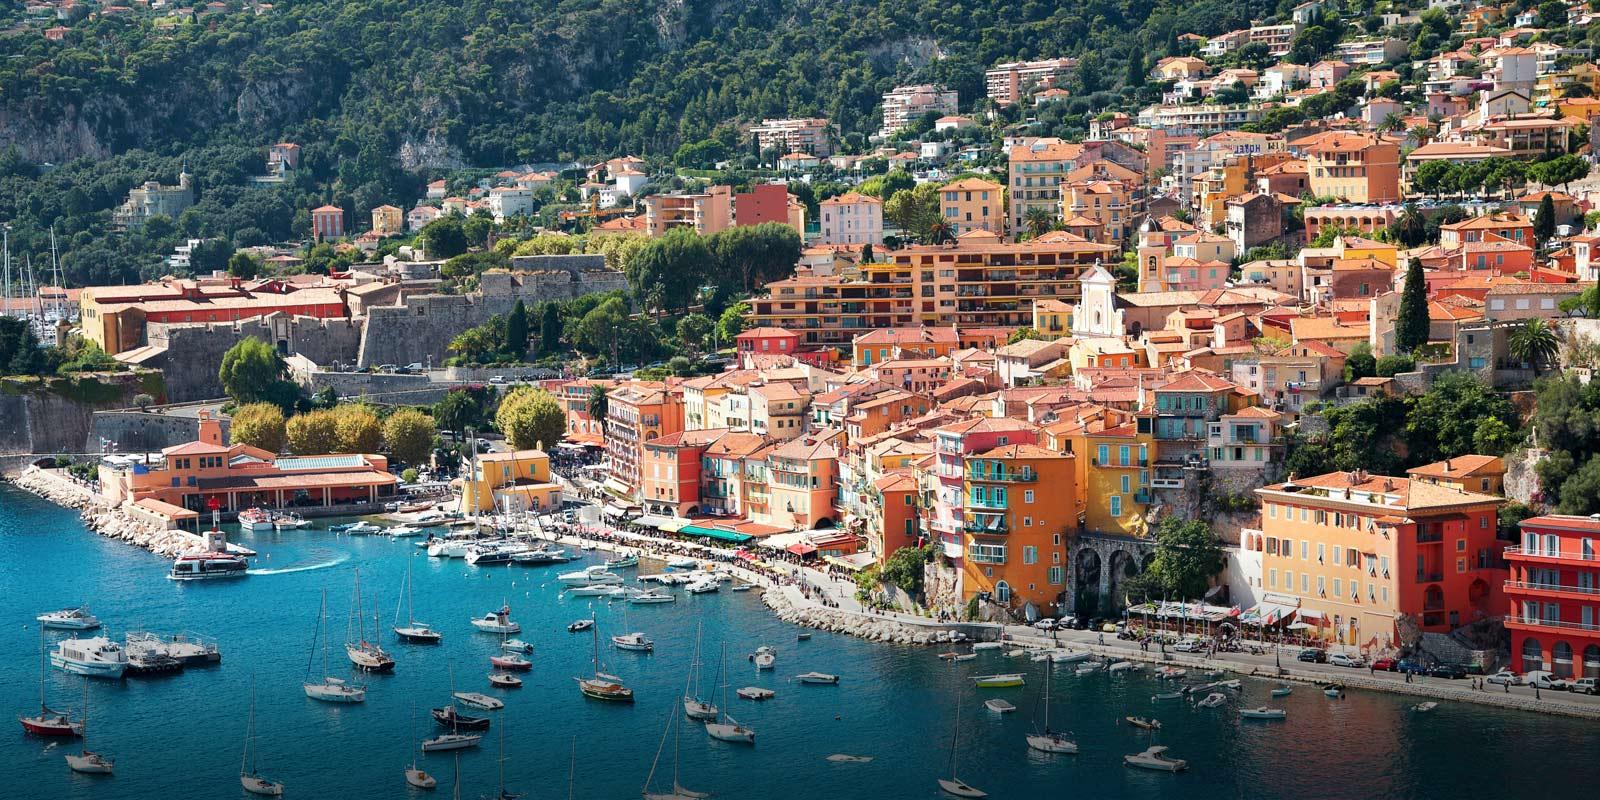 Kryssning / Cruise Rivieran Medelhavet / Middelhavet Club Eriks